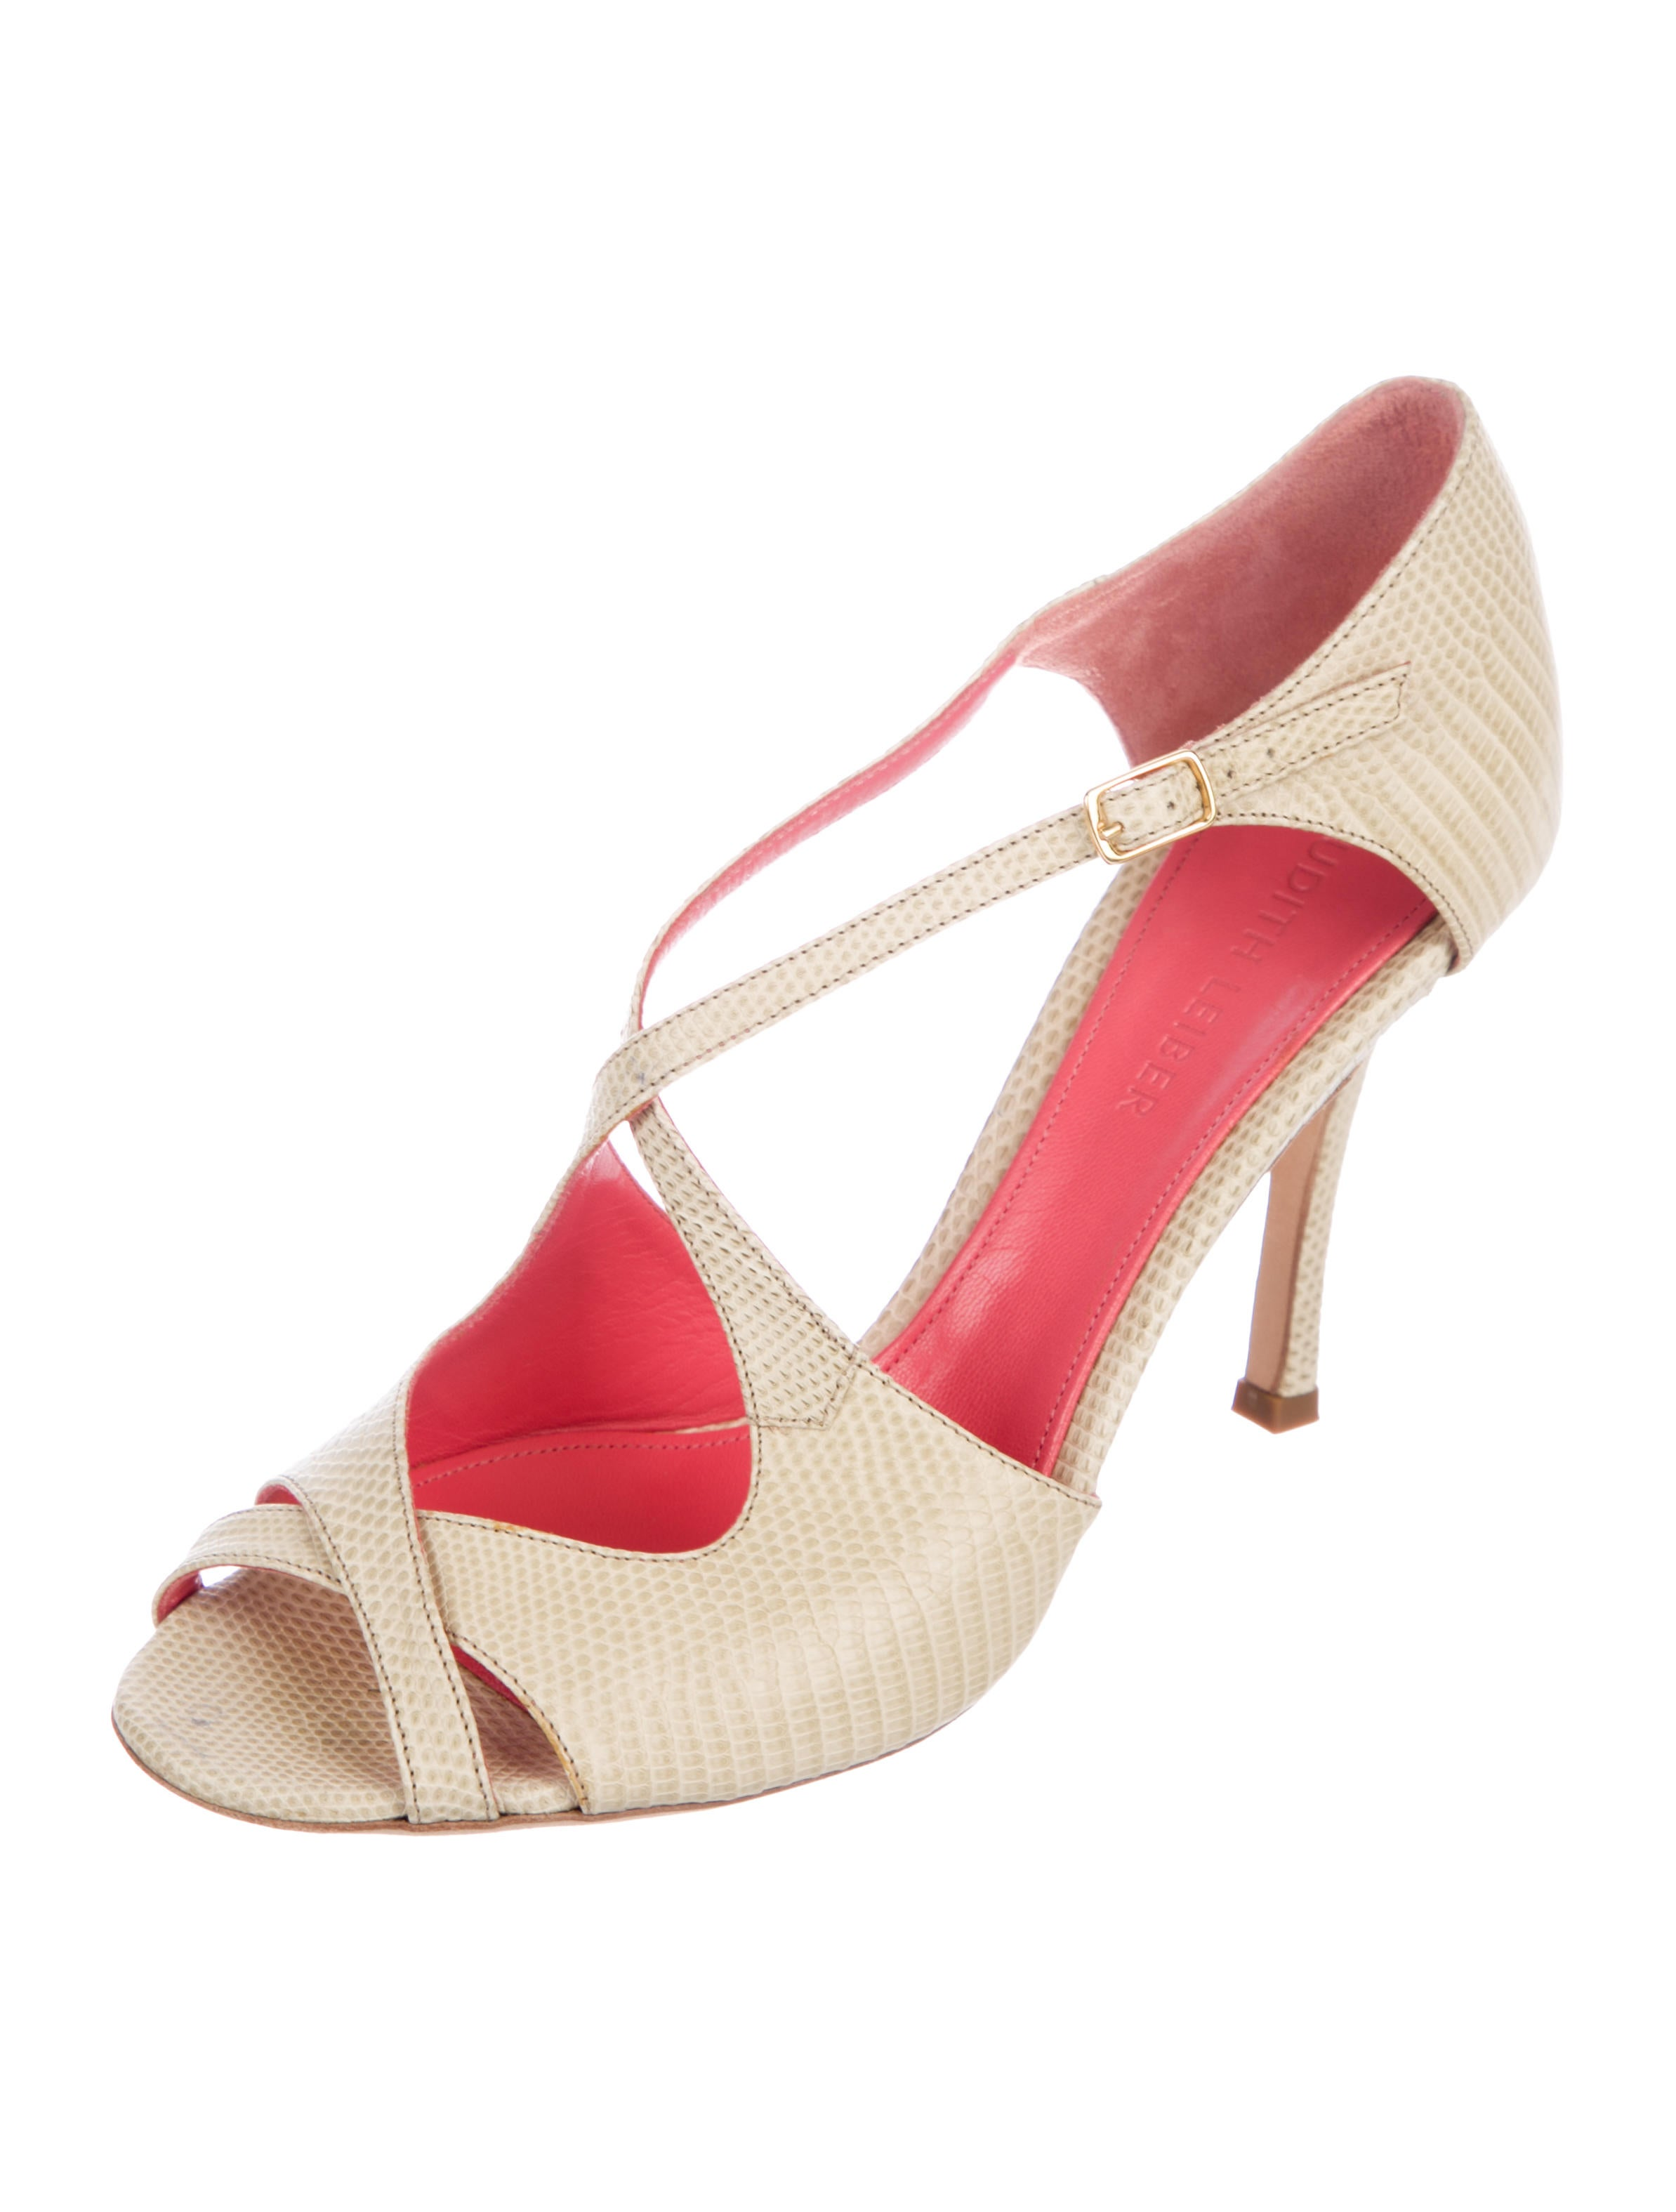 clearance eastbay Judith Leiber Lizard Crossover Sandals clearance best wholesale ZntSVZ0shu